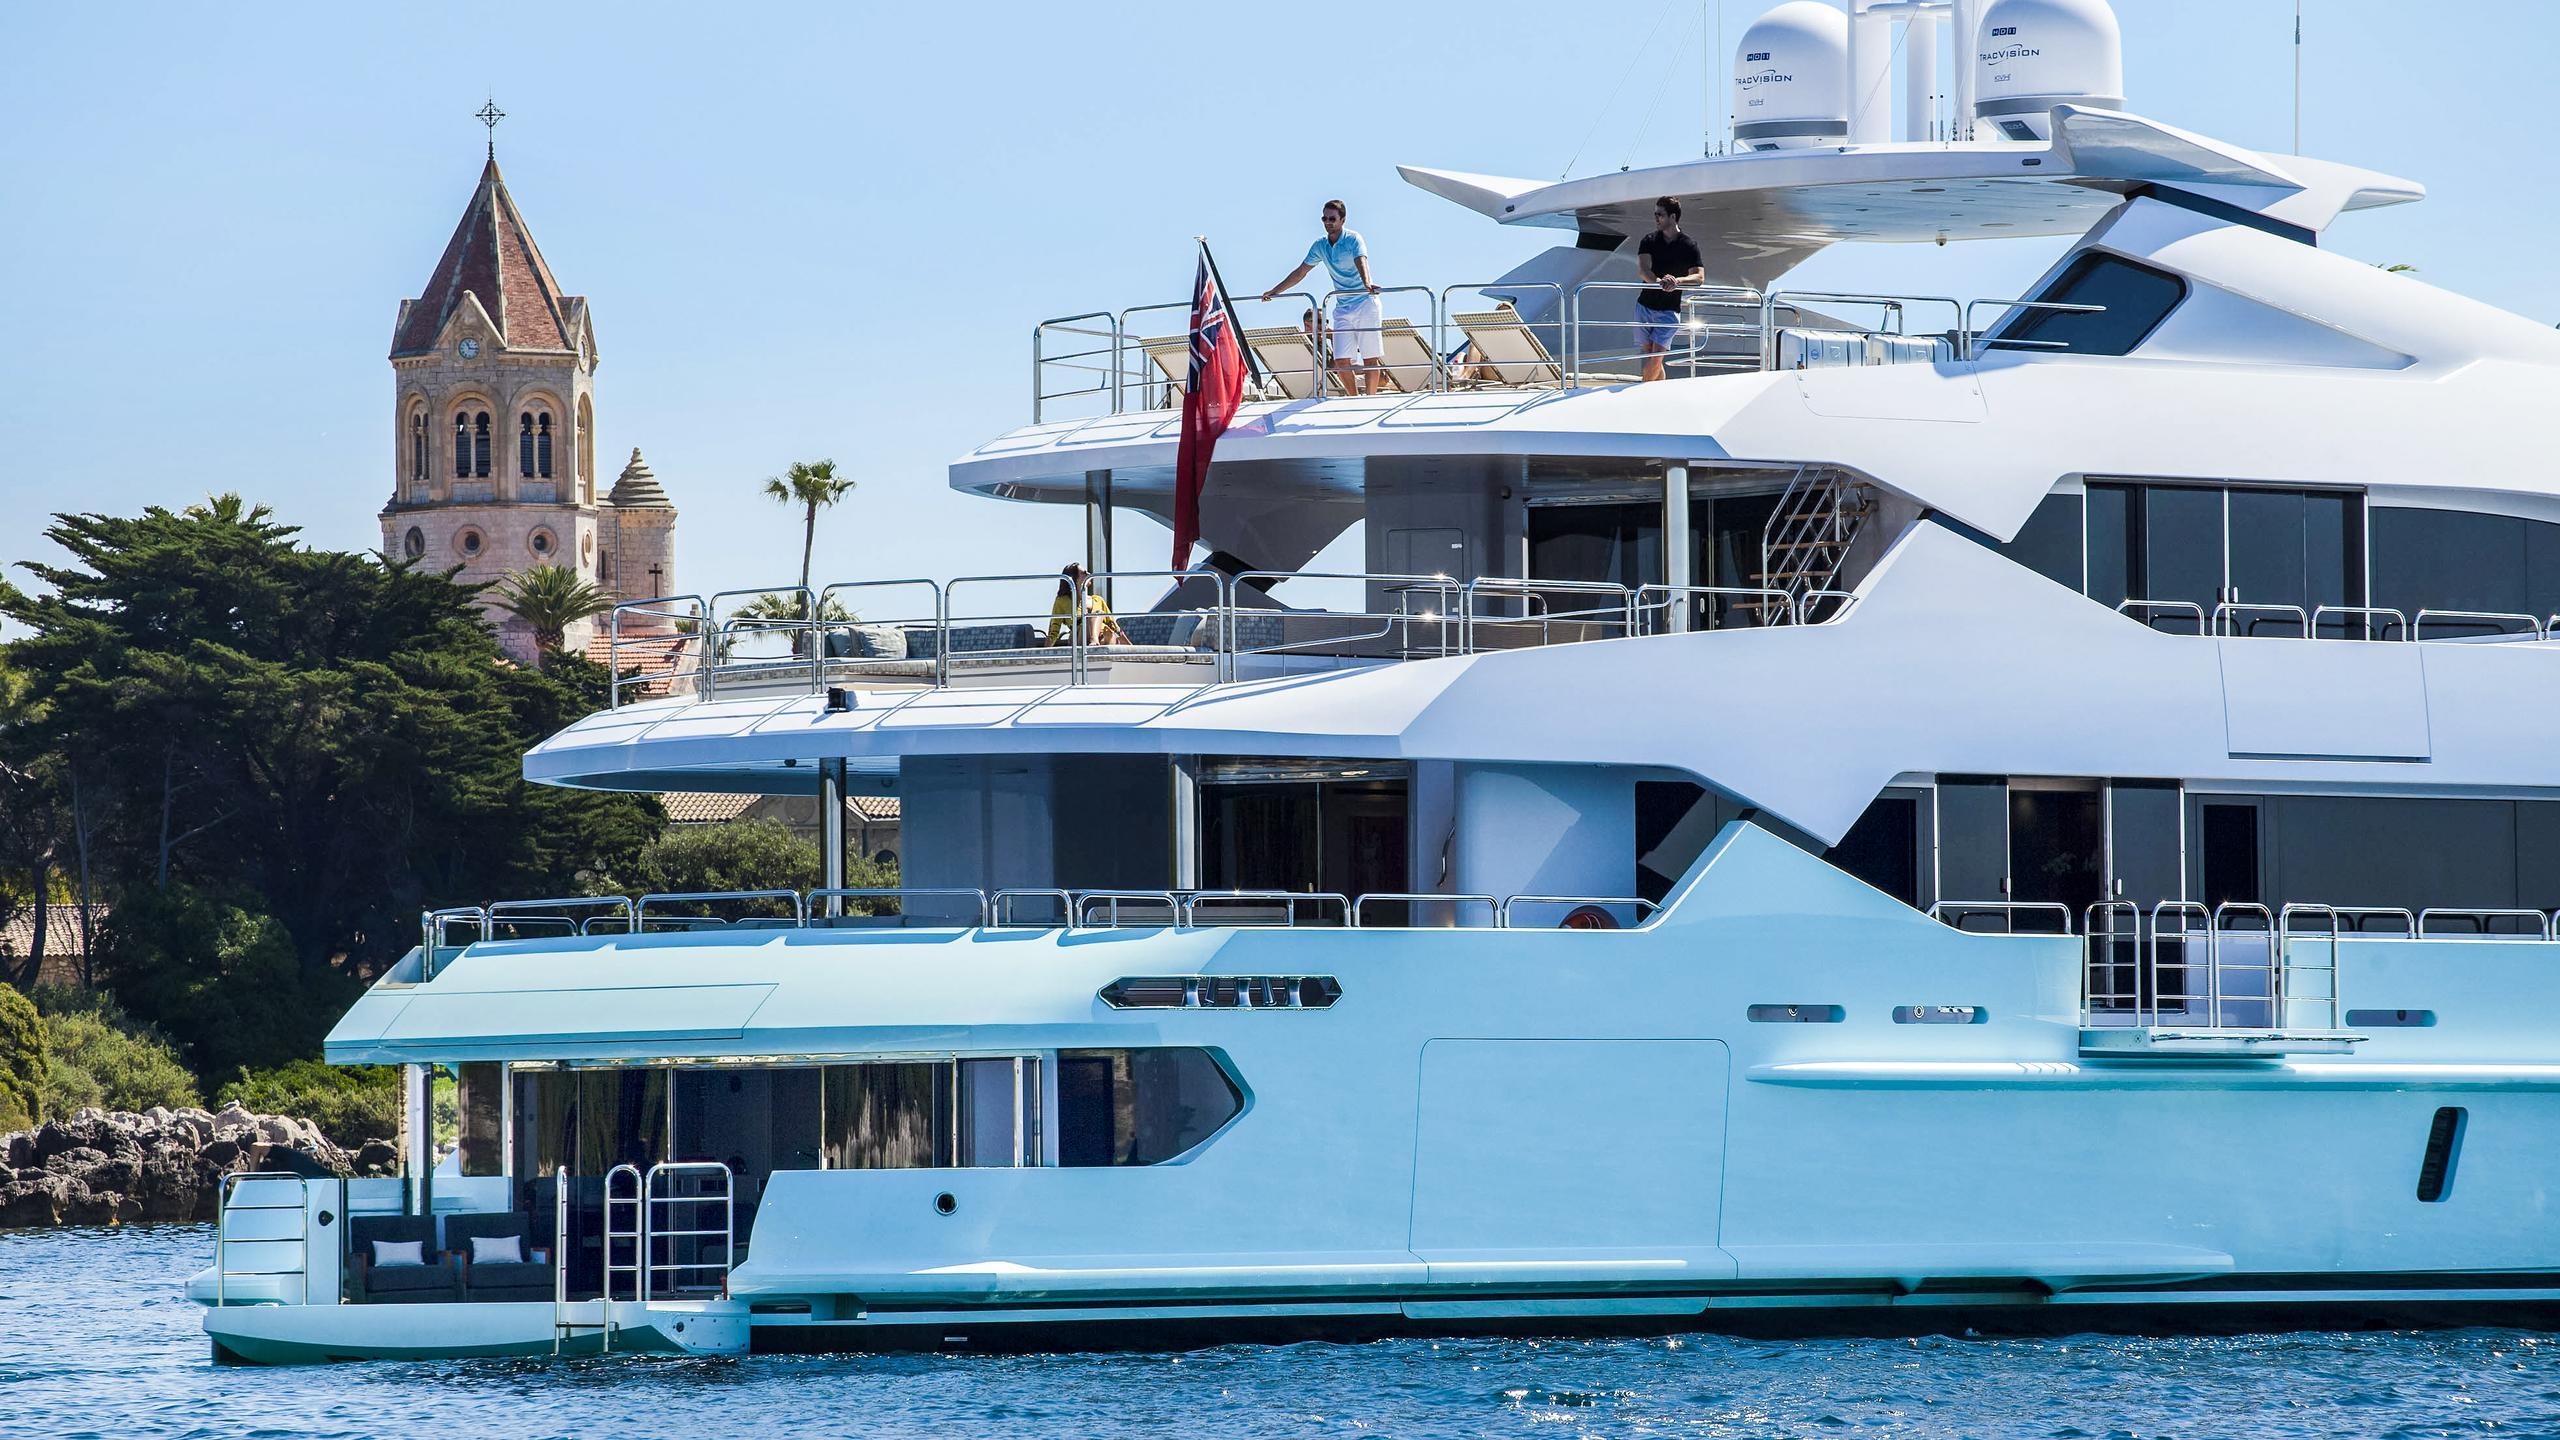 arados-blush-motor-yacht-sunseeker-2014-47m-stern